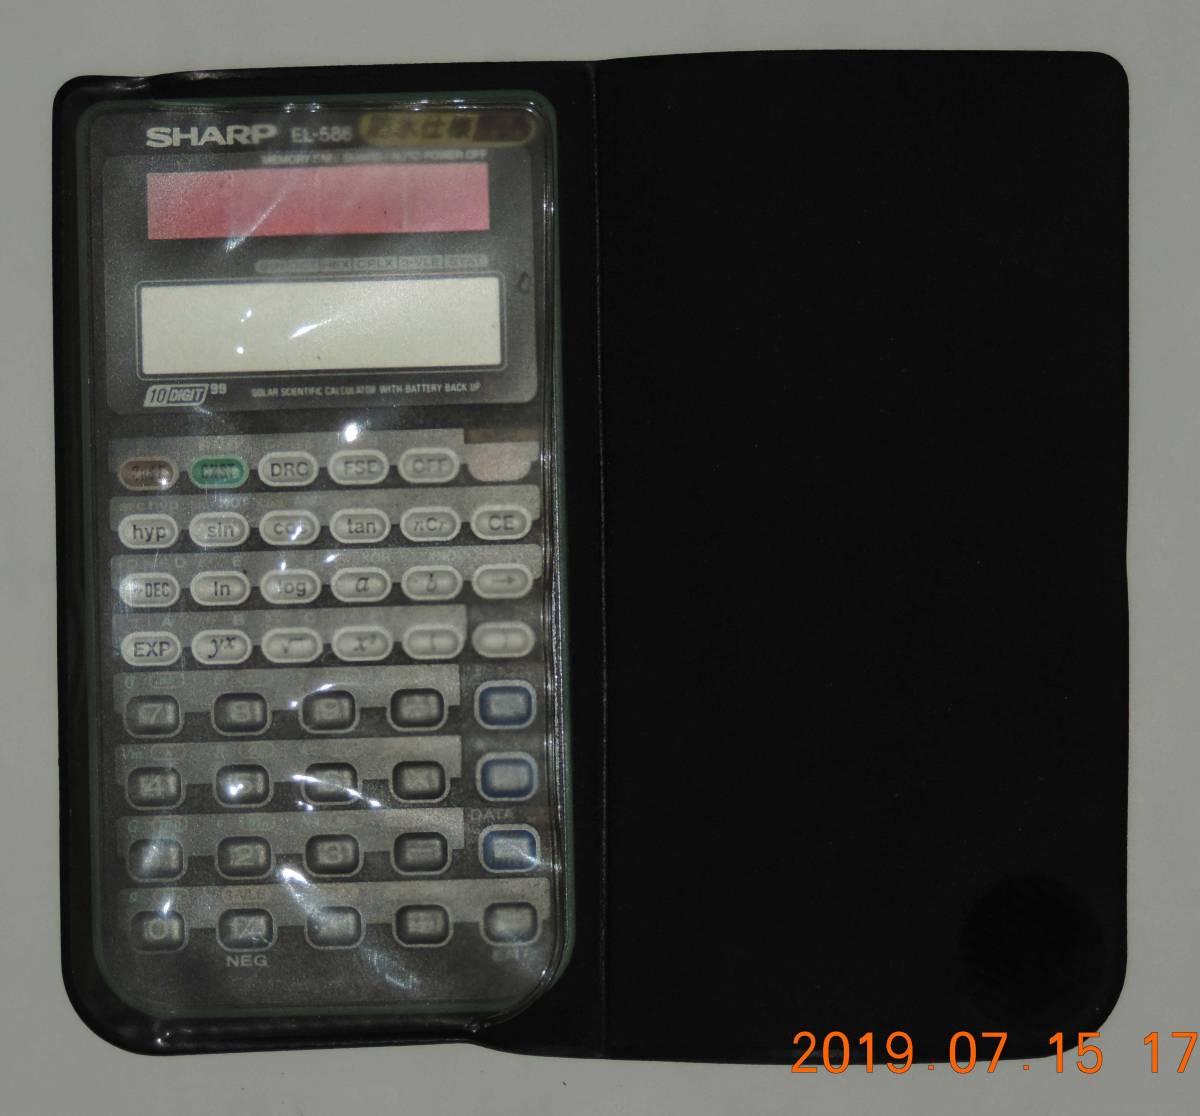 ★ SHARP 超薄型防水(JIS防まつ型)関数電卓 EL-586 ★_画像4